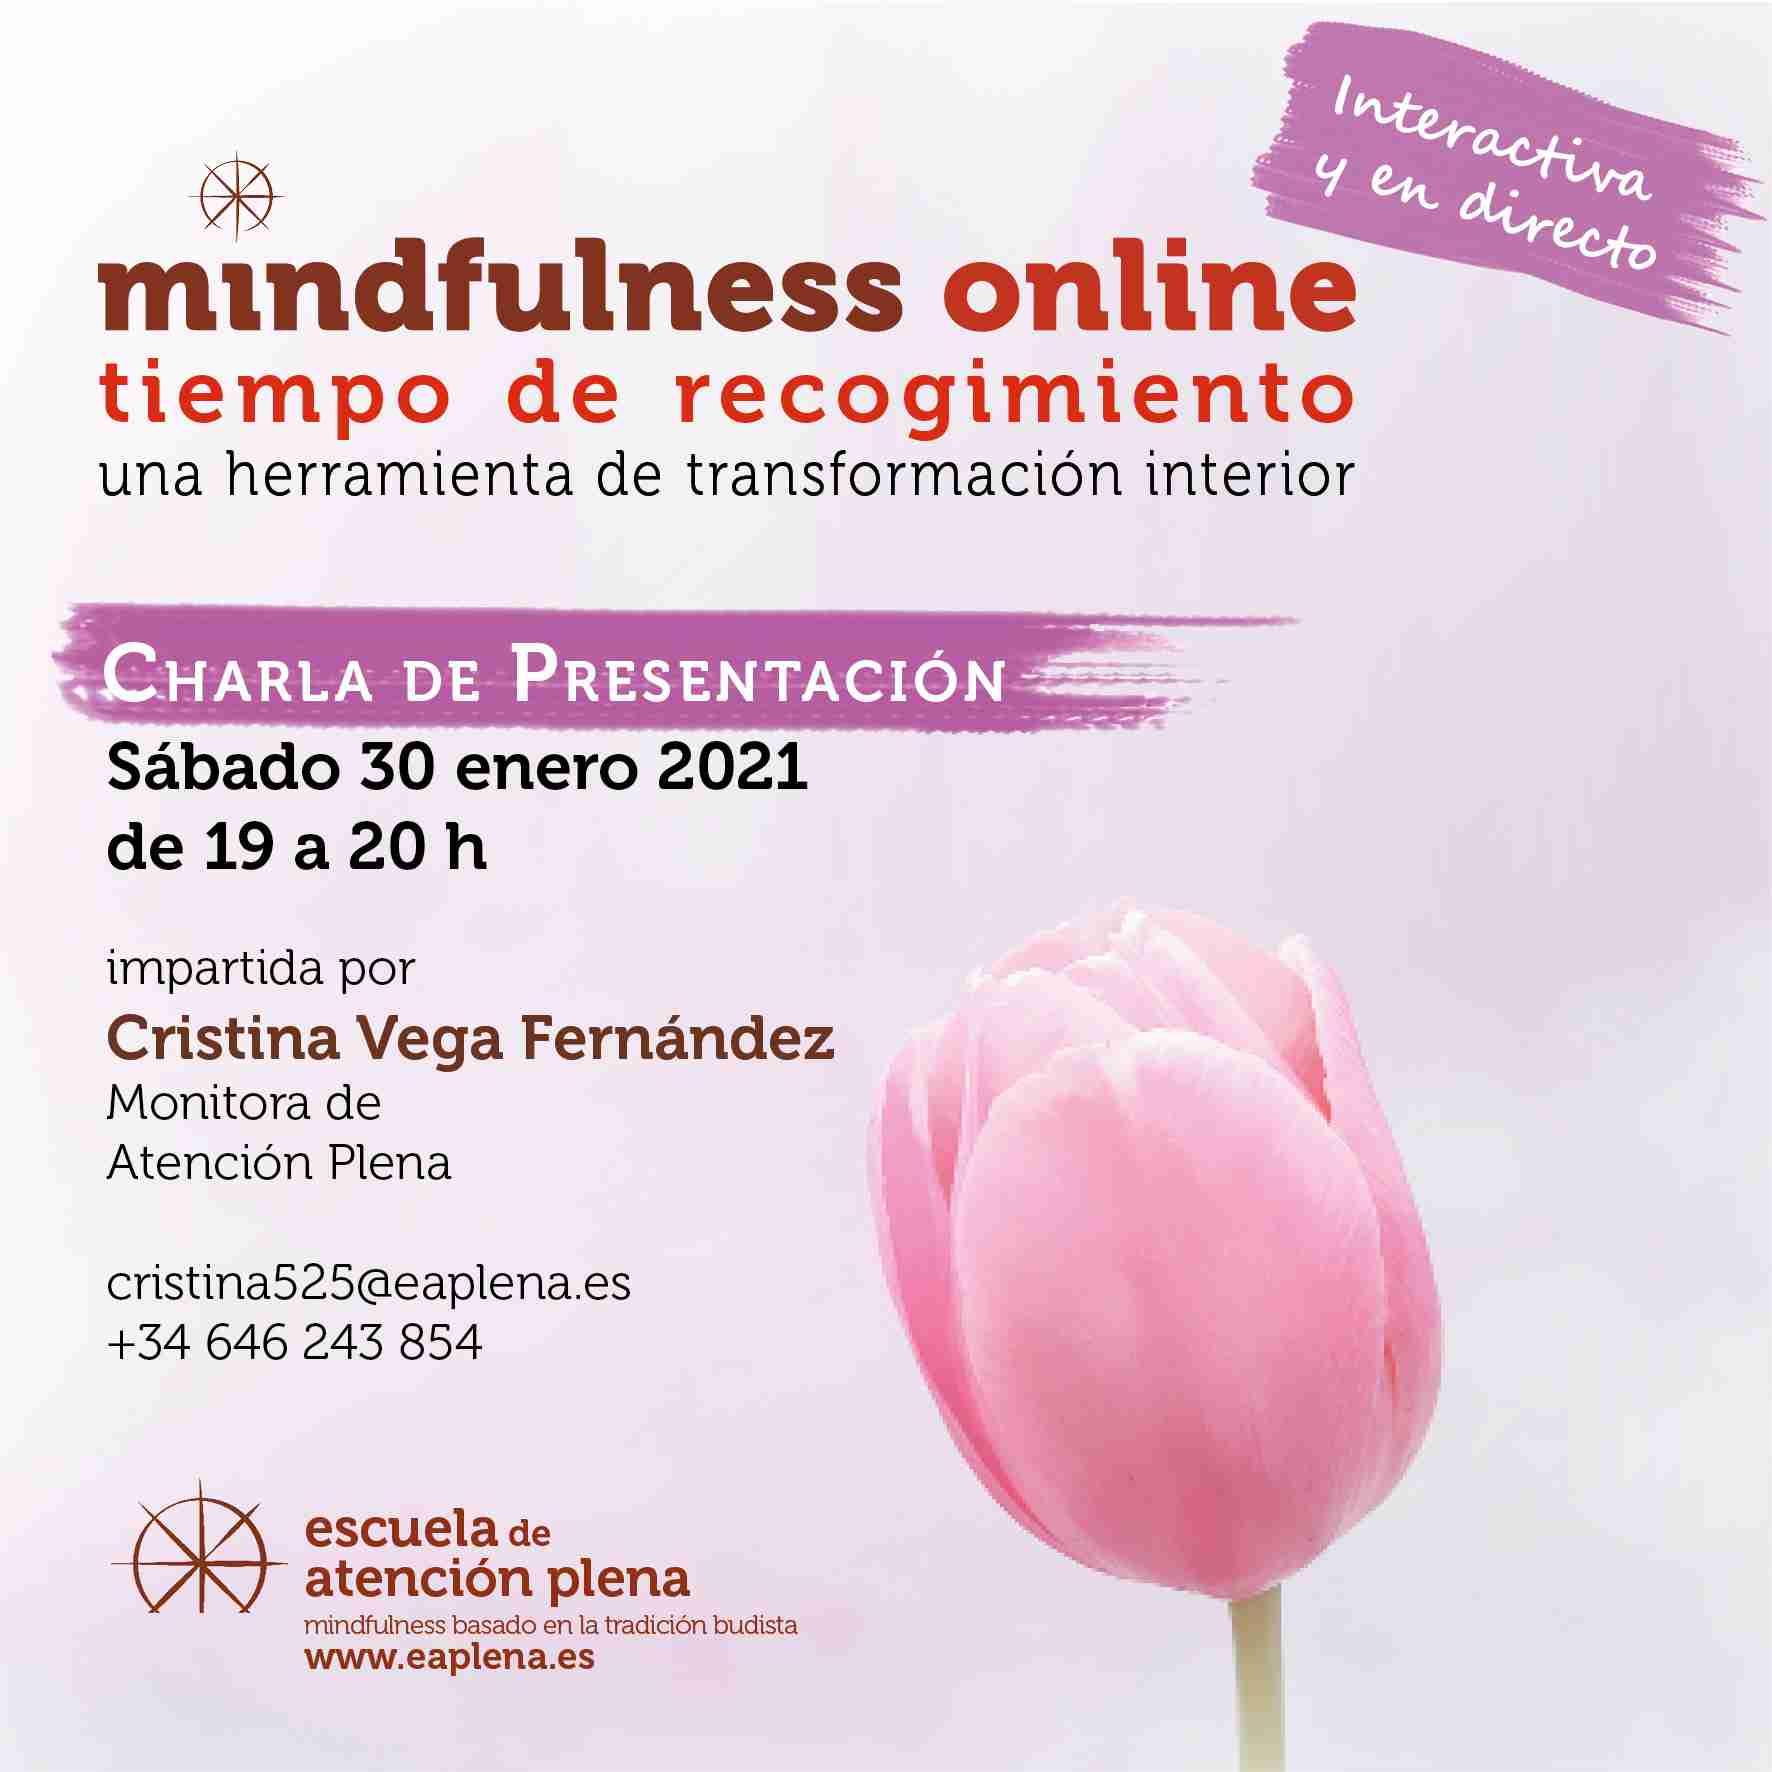 2021-01-30 Charla de Presentacion 1 Cristina Vega